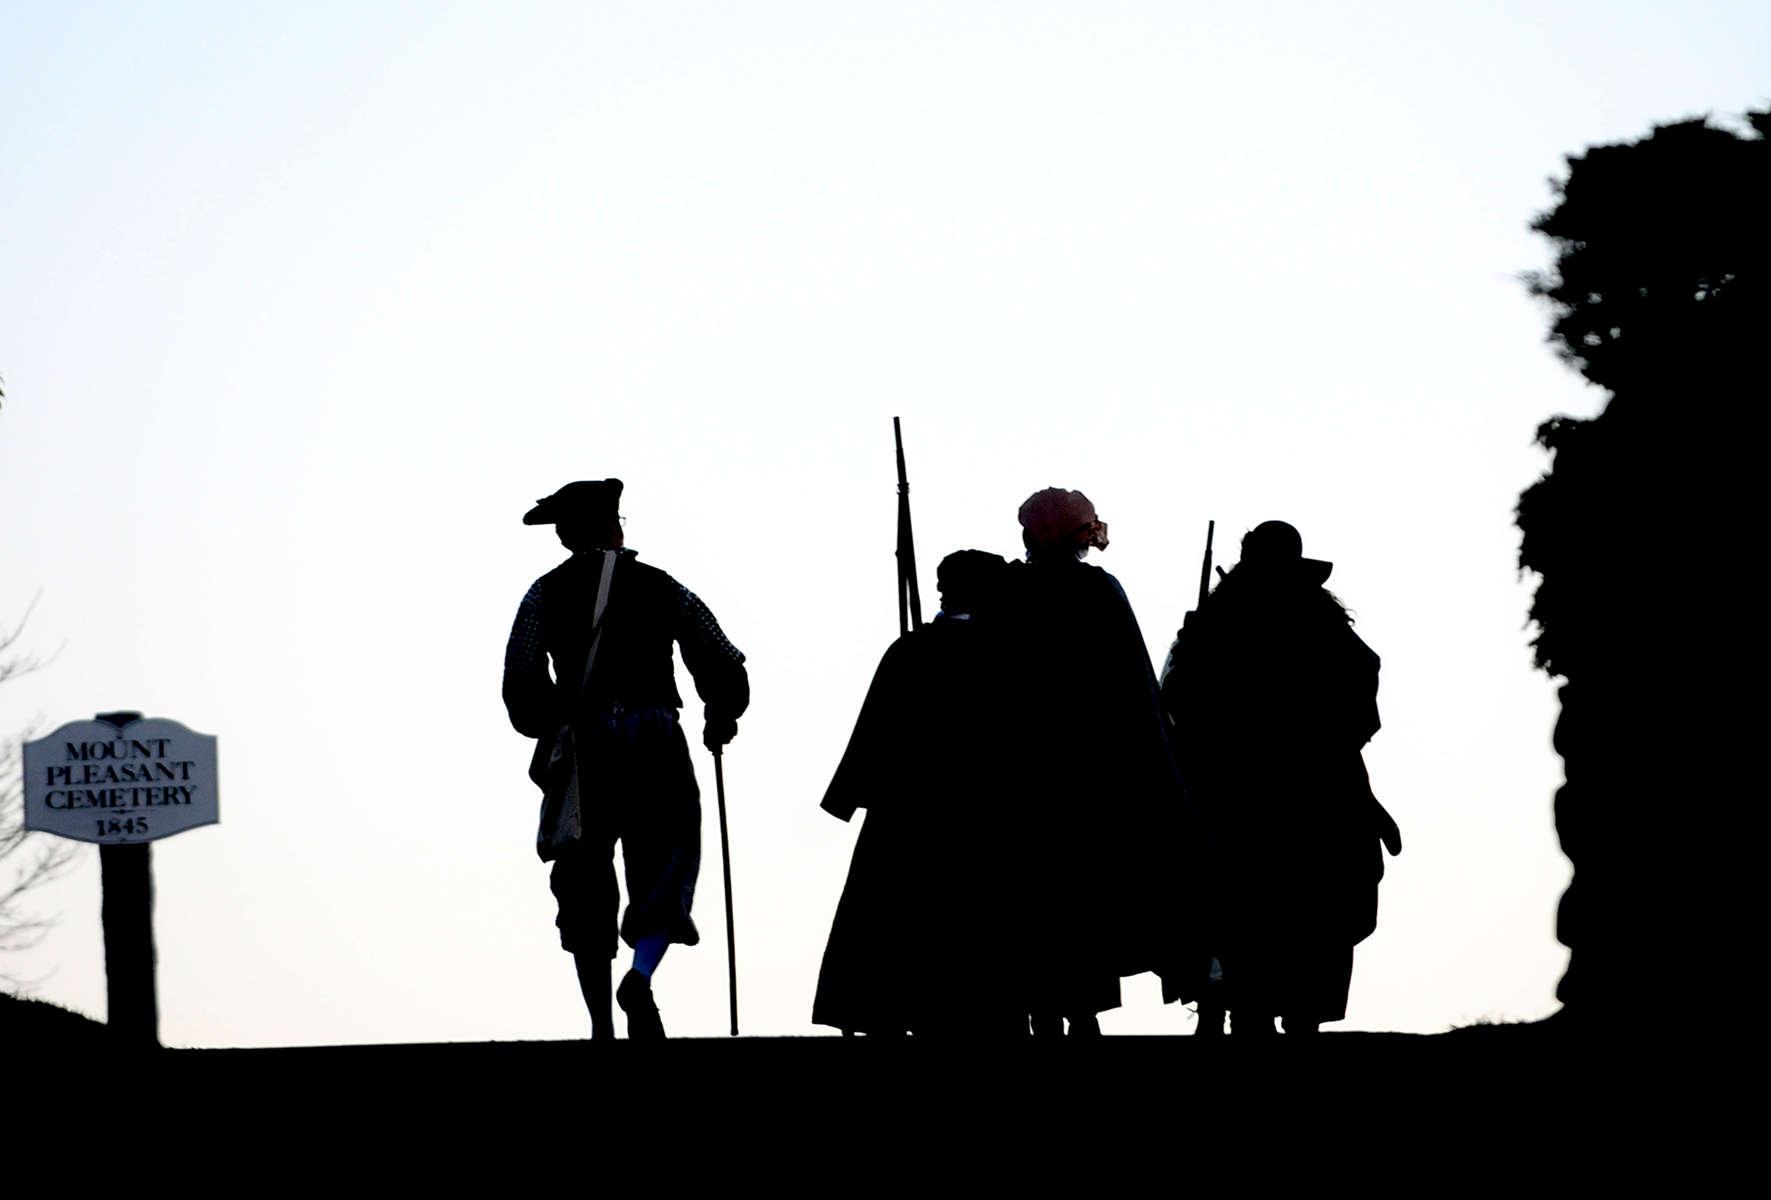 Sudbury's Minute and Militia reenactors march to Concord Patriots Day morning.  Daily News Staff Photo/Art Illman